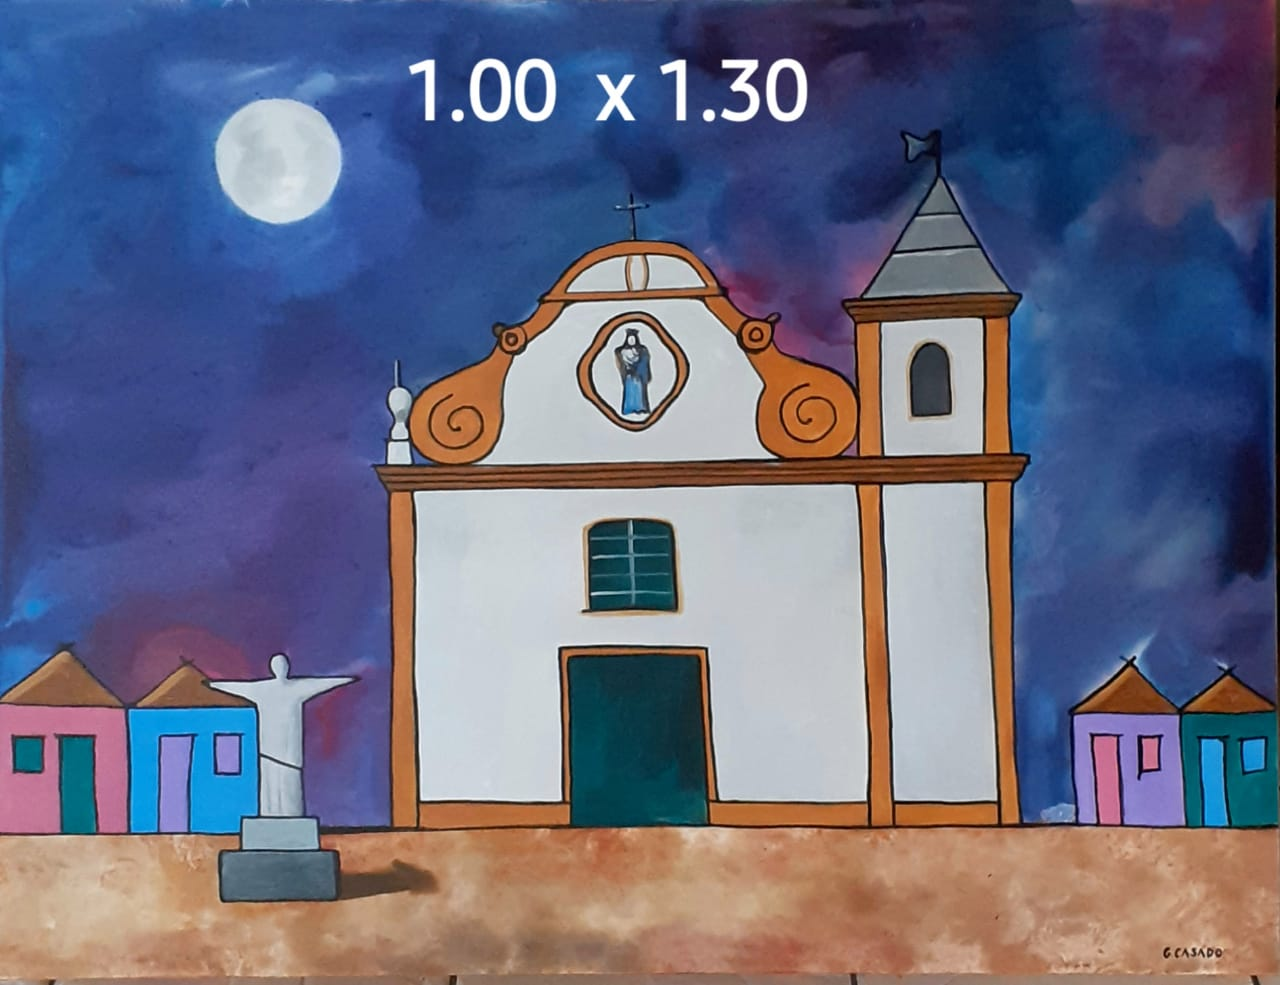 lua-dajuda-004-1-00-x-1-30